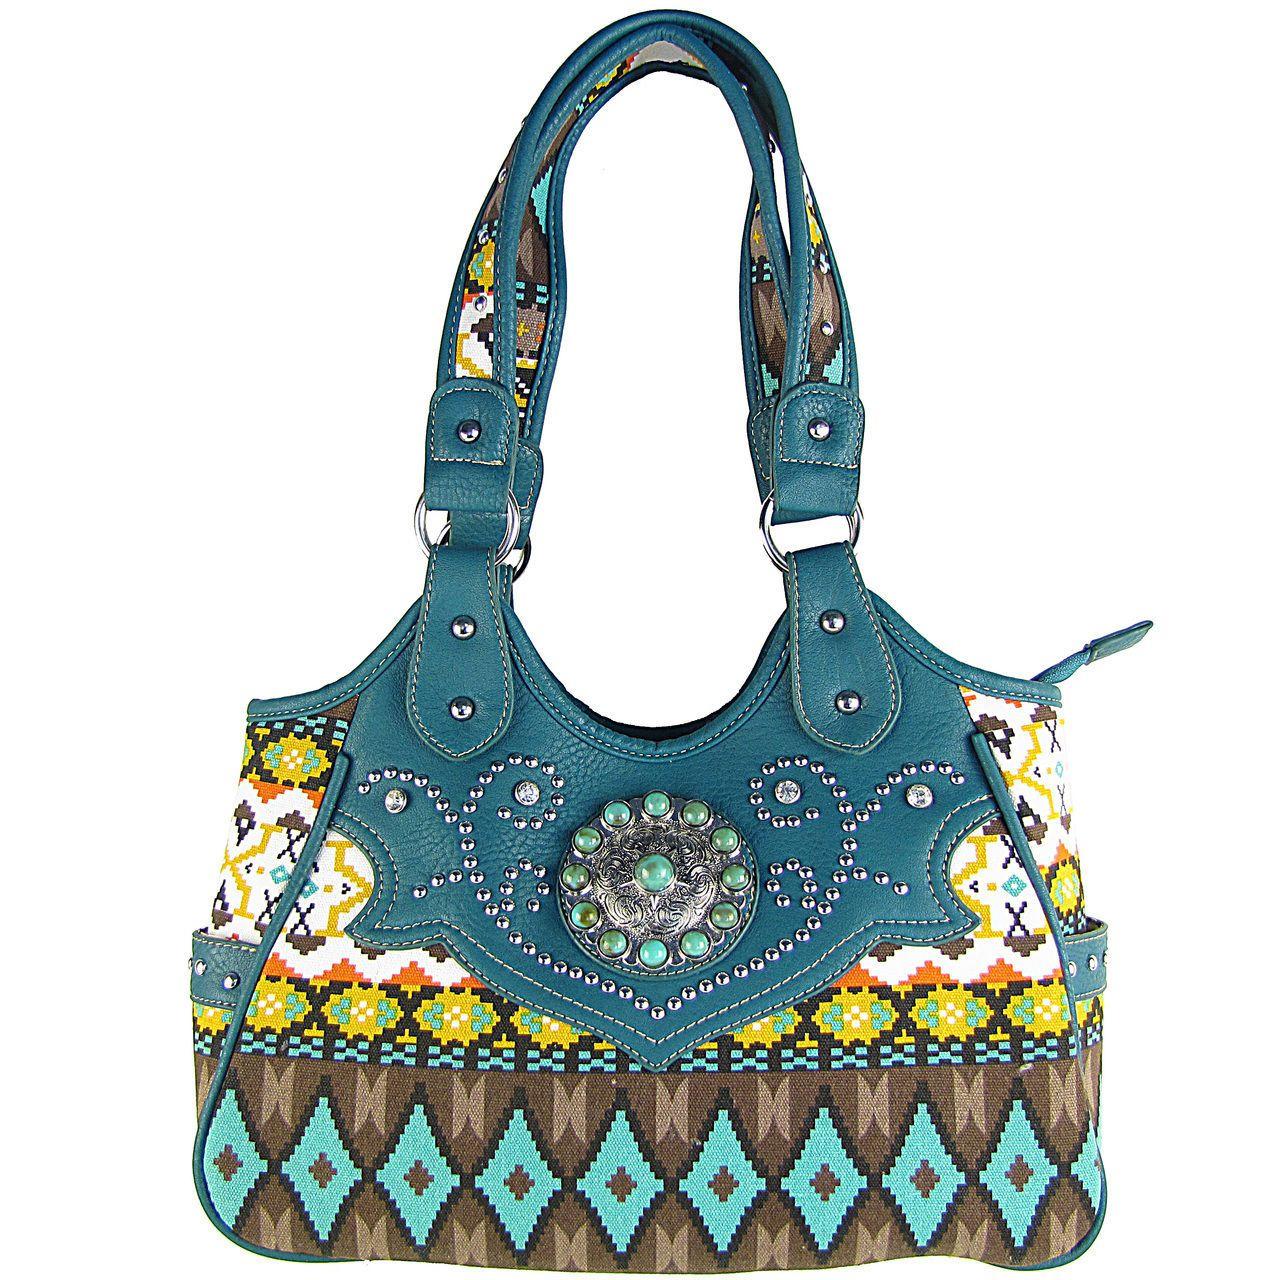 9011629c33b5 Turquoise tribal flower look shoulder handbag new concealed carry ...